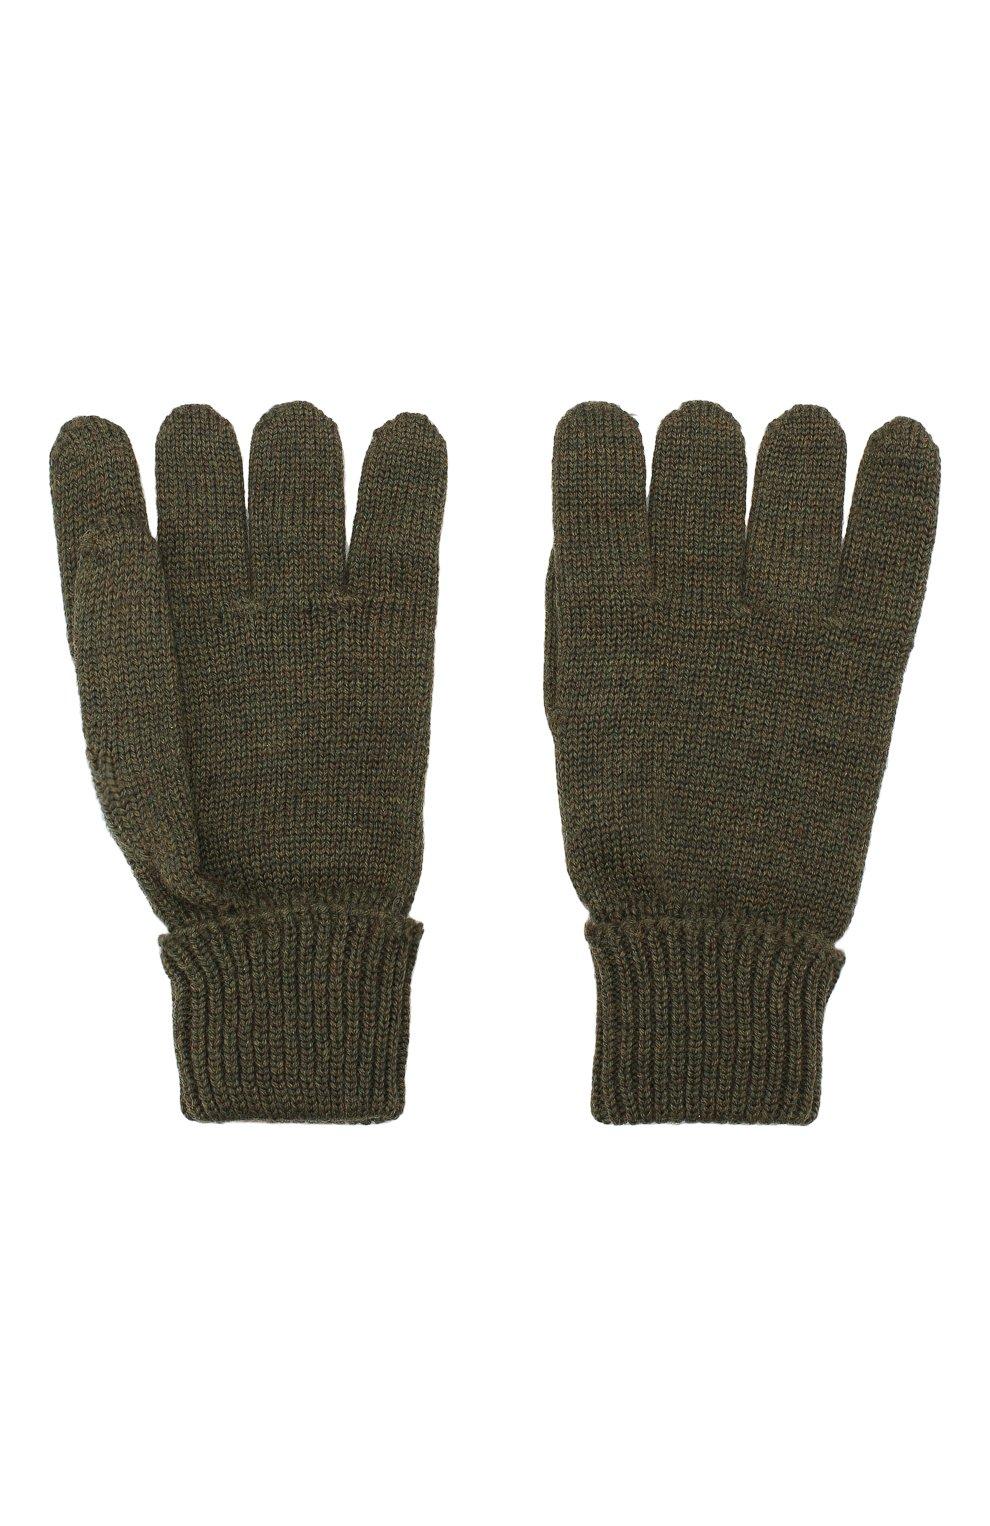 Детские шерстяные перчатки IL TRENINO хаки цвета, арт. 19 5059/E0   Фото 2